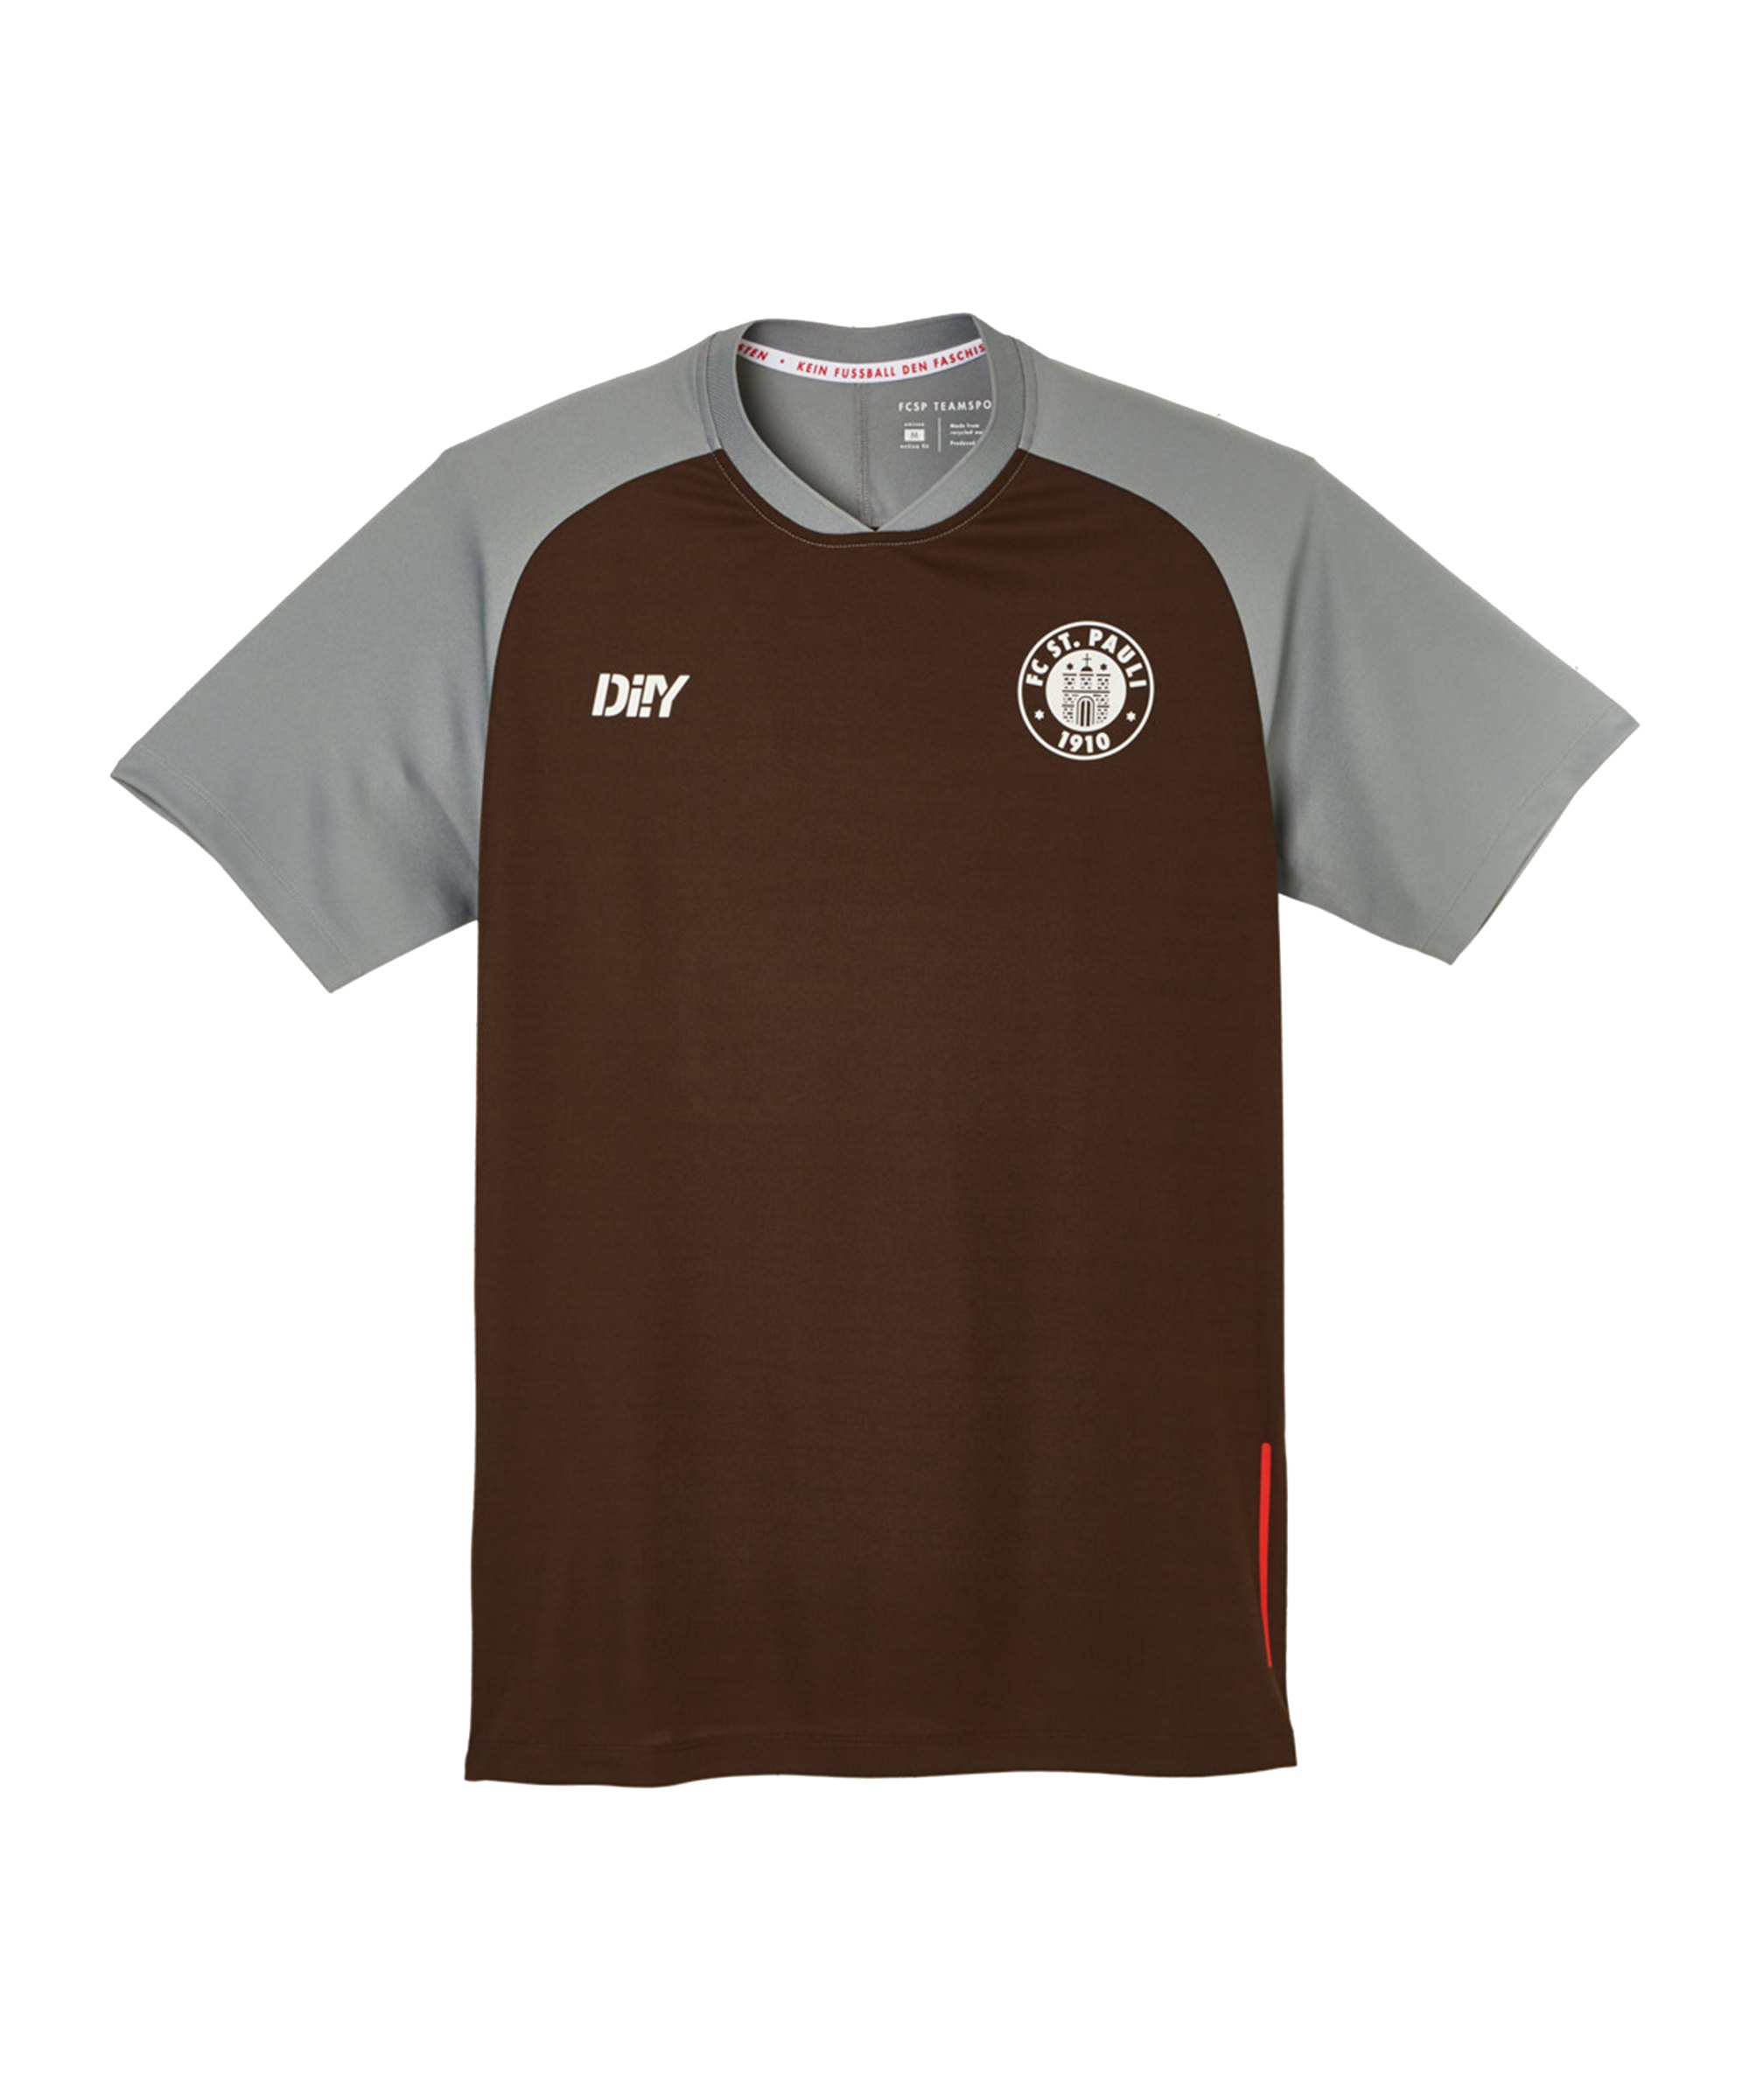 DIIY FC St. Pauli Trainingsshirt Braun - braun